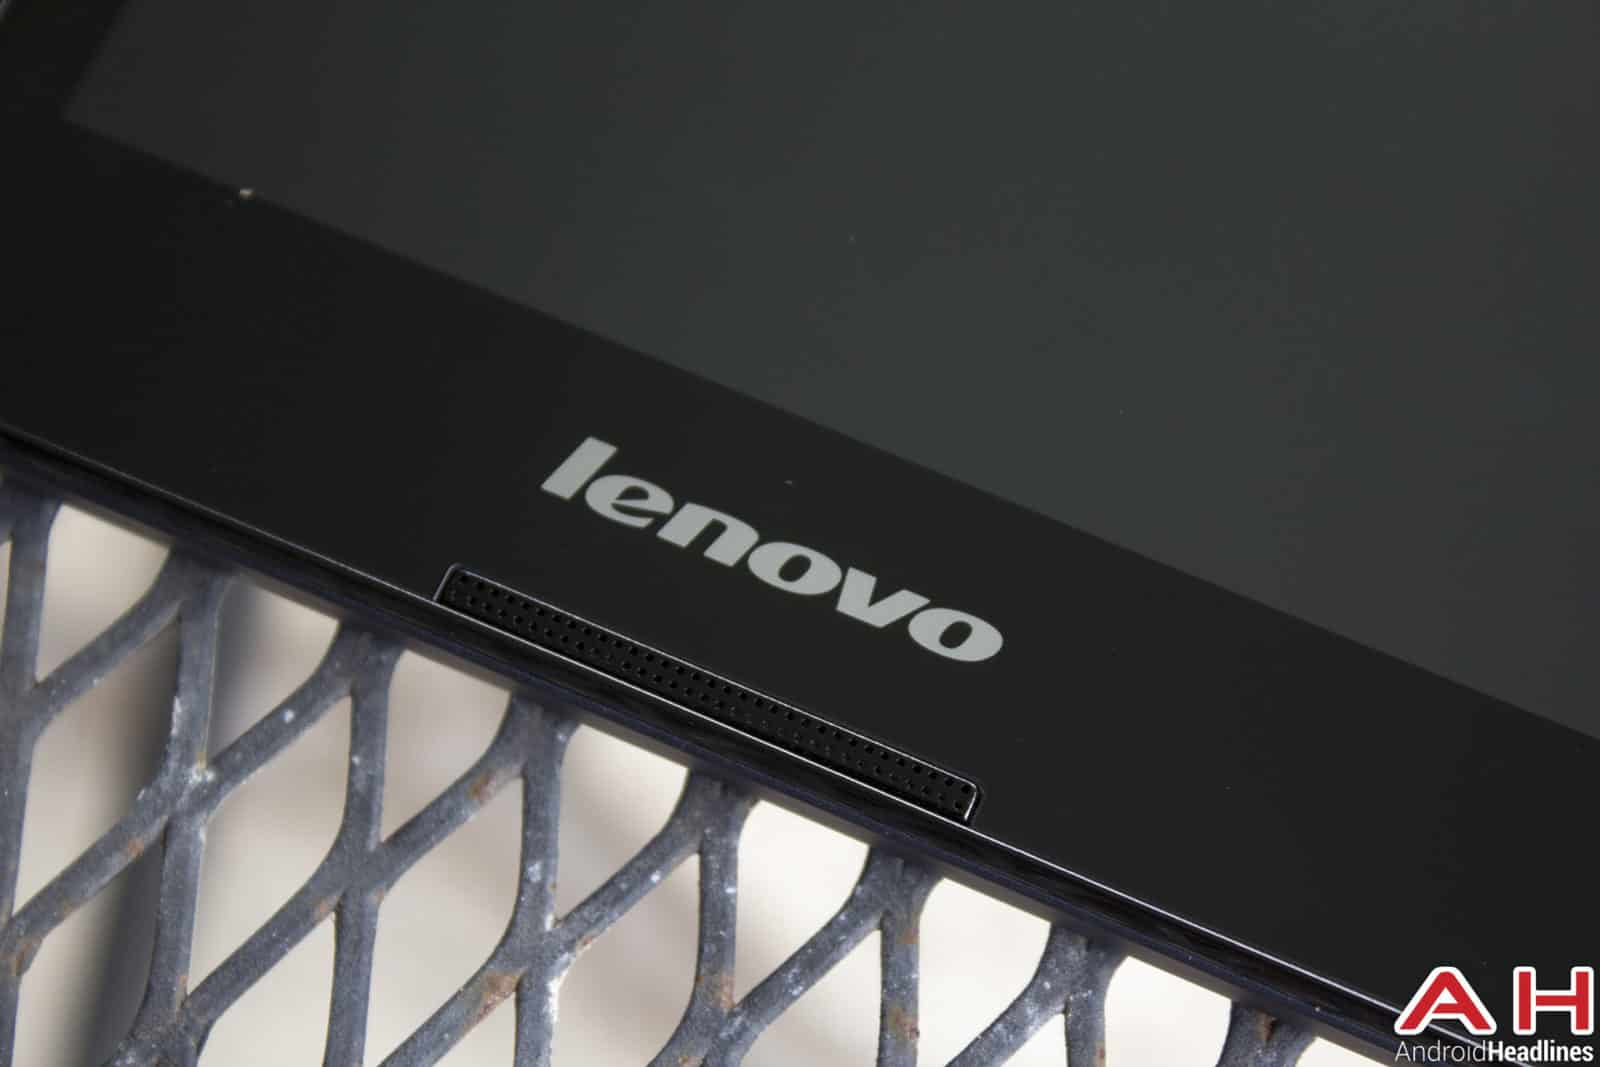 Lenovo-Tab-2-A8-Review-AH-logo-1